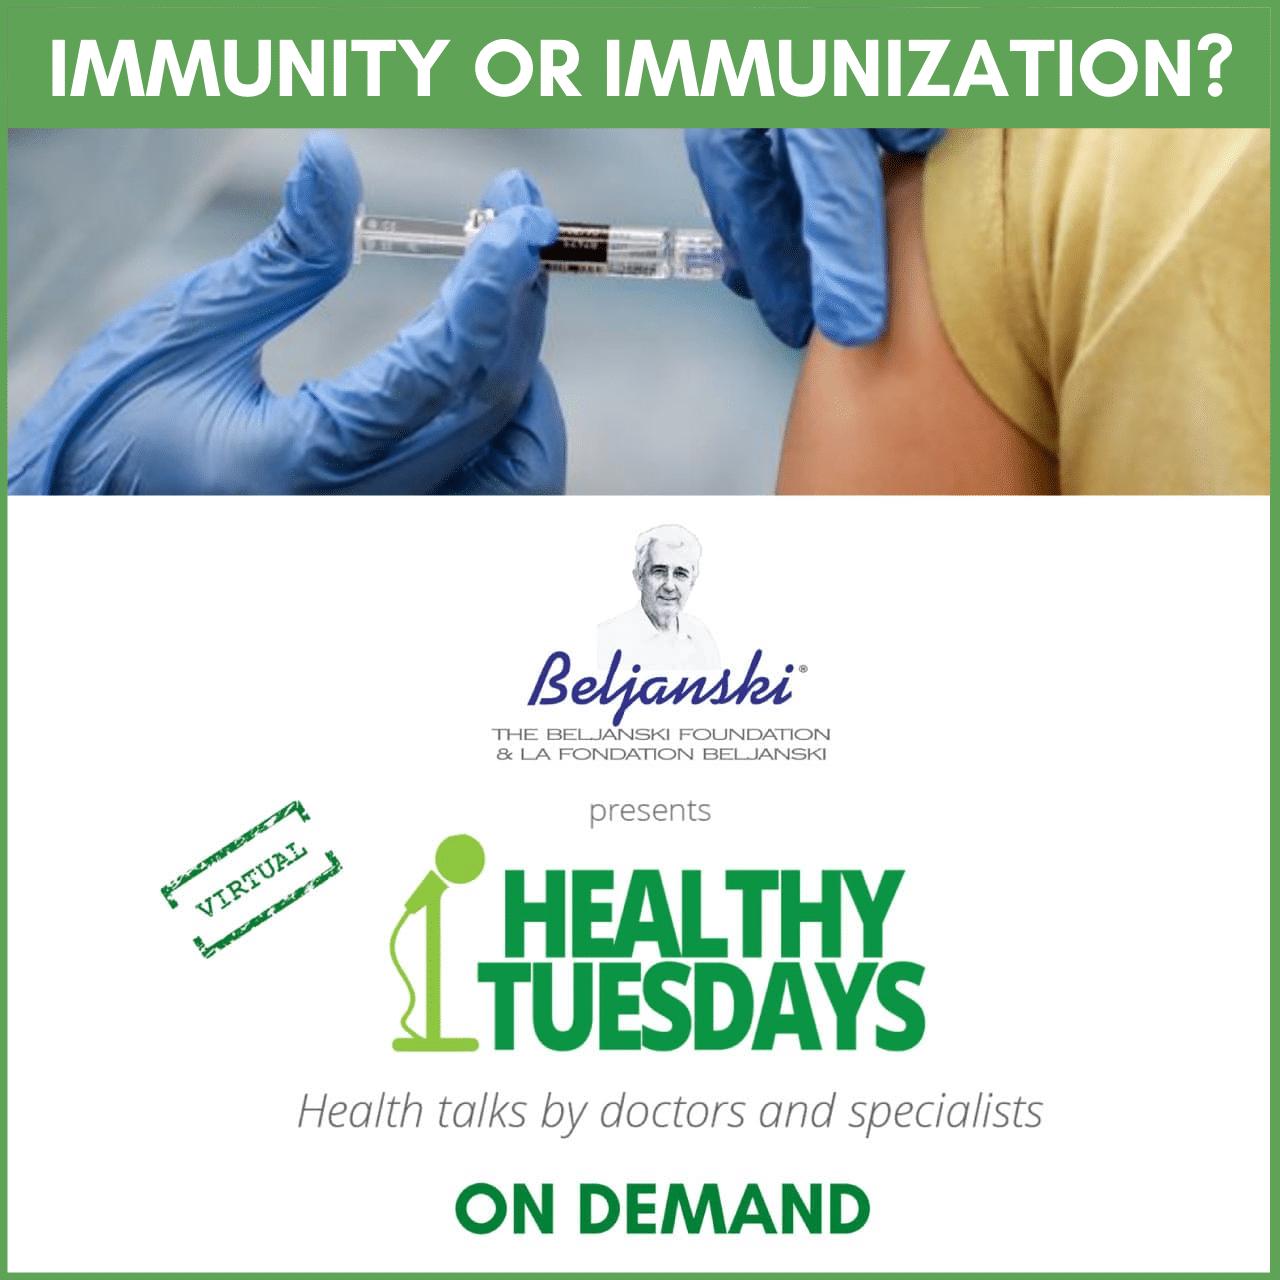 immunity or immunization on demand thumbnail